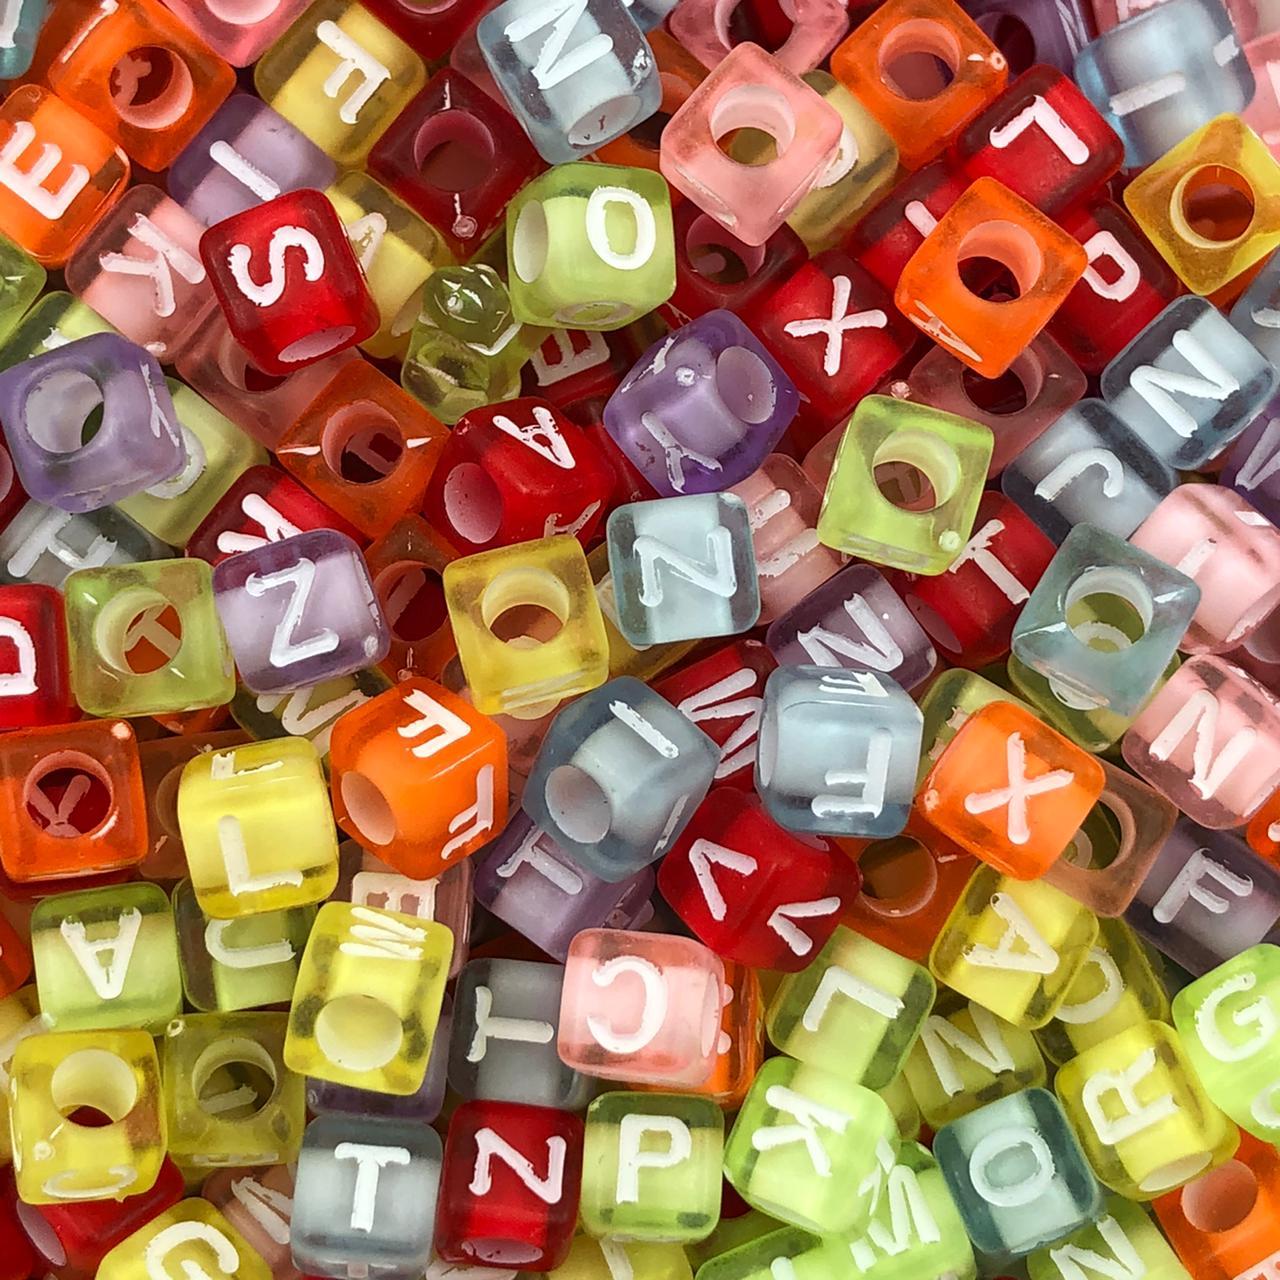 LT15 - Cubo Letras Sortidas 6x6mm Colorida Fluorescente - 20Grs